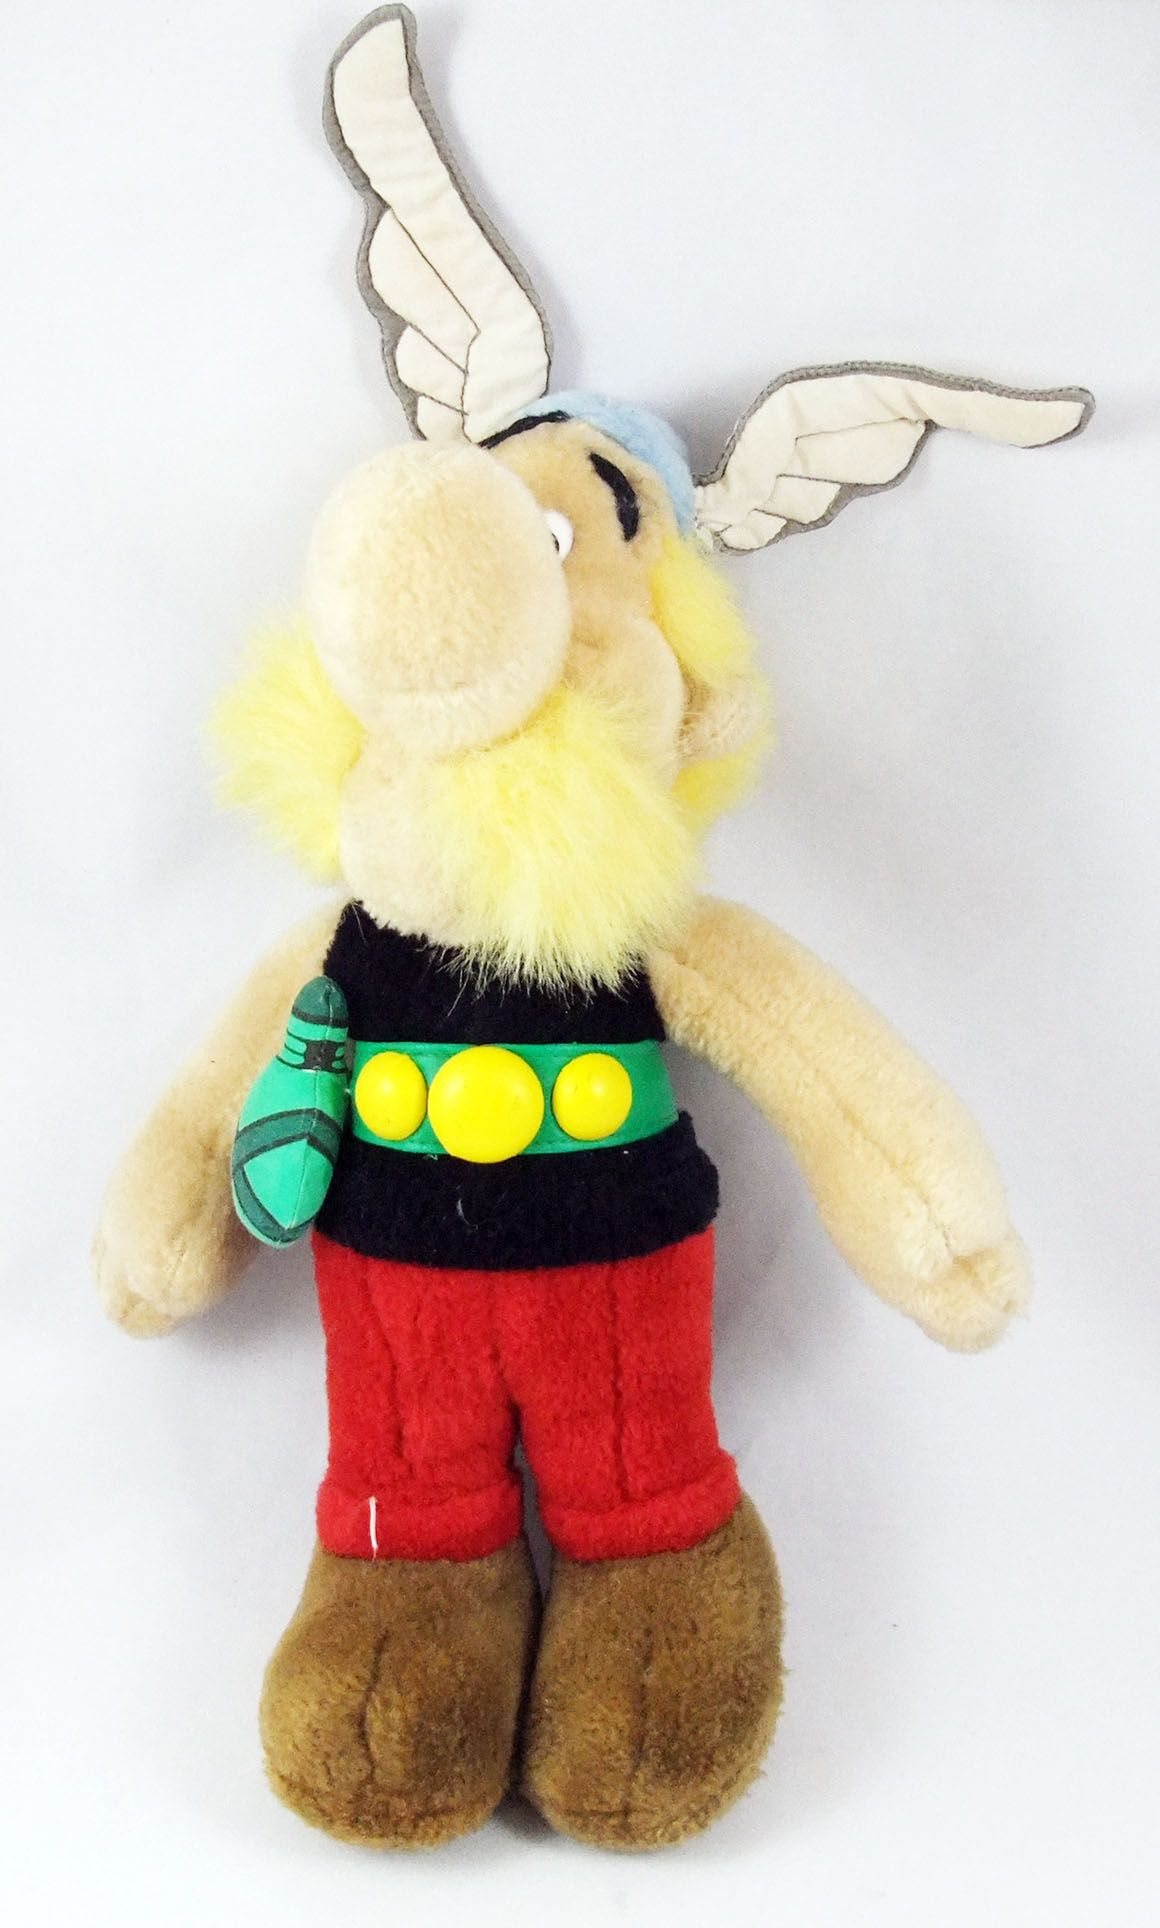 Asterix - Peluche Michael Mühleck 1994 - Asterix le gaulois